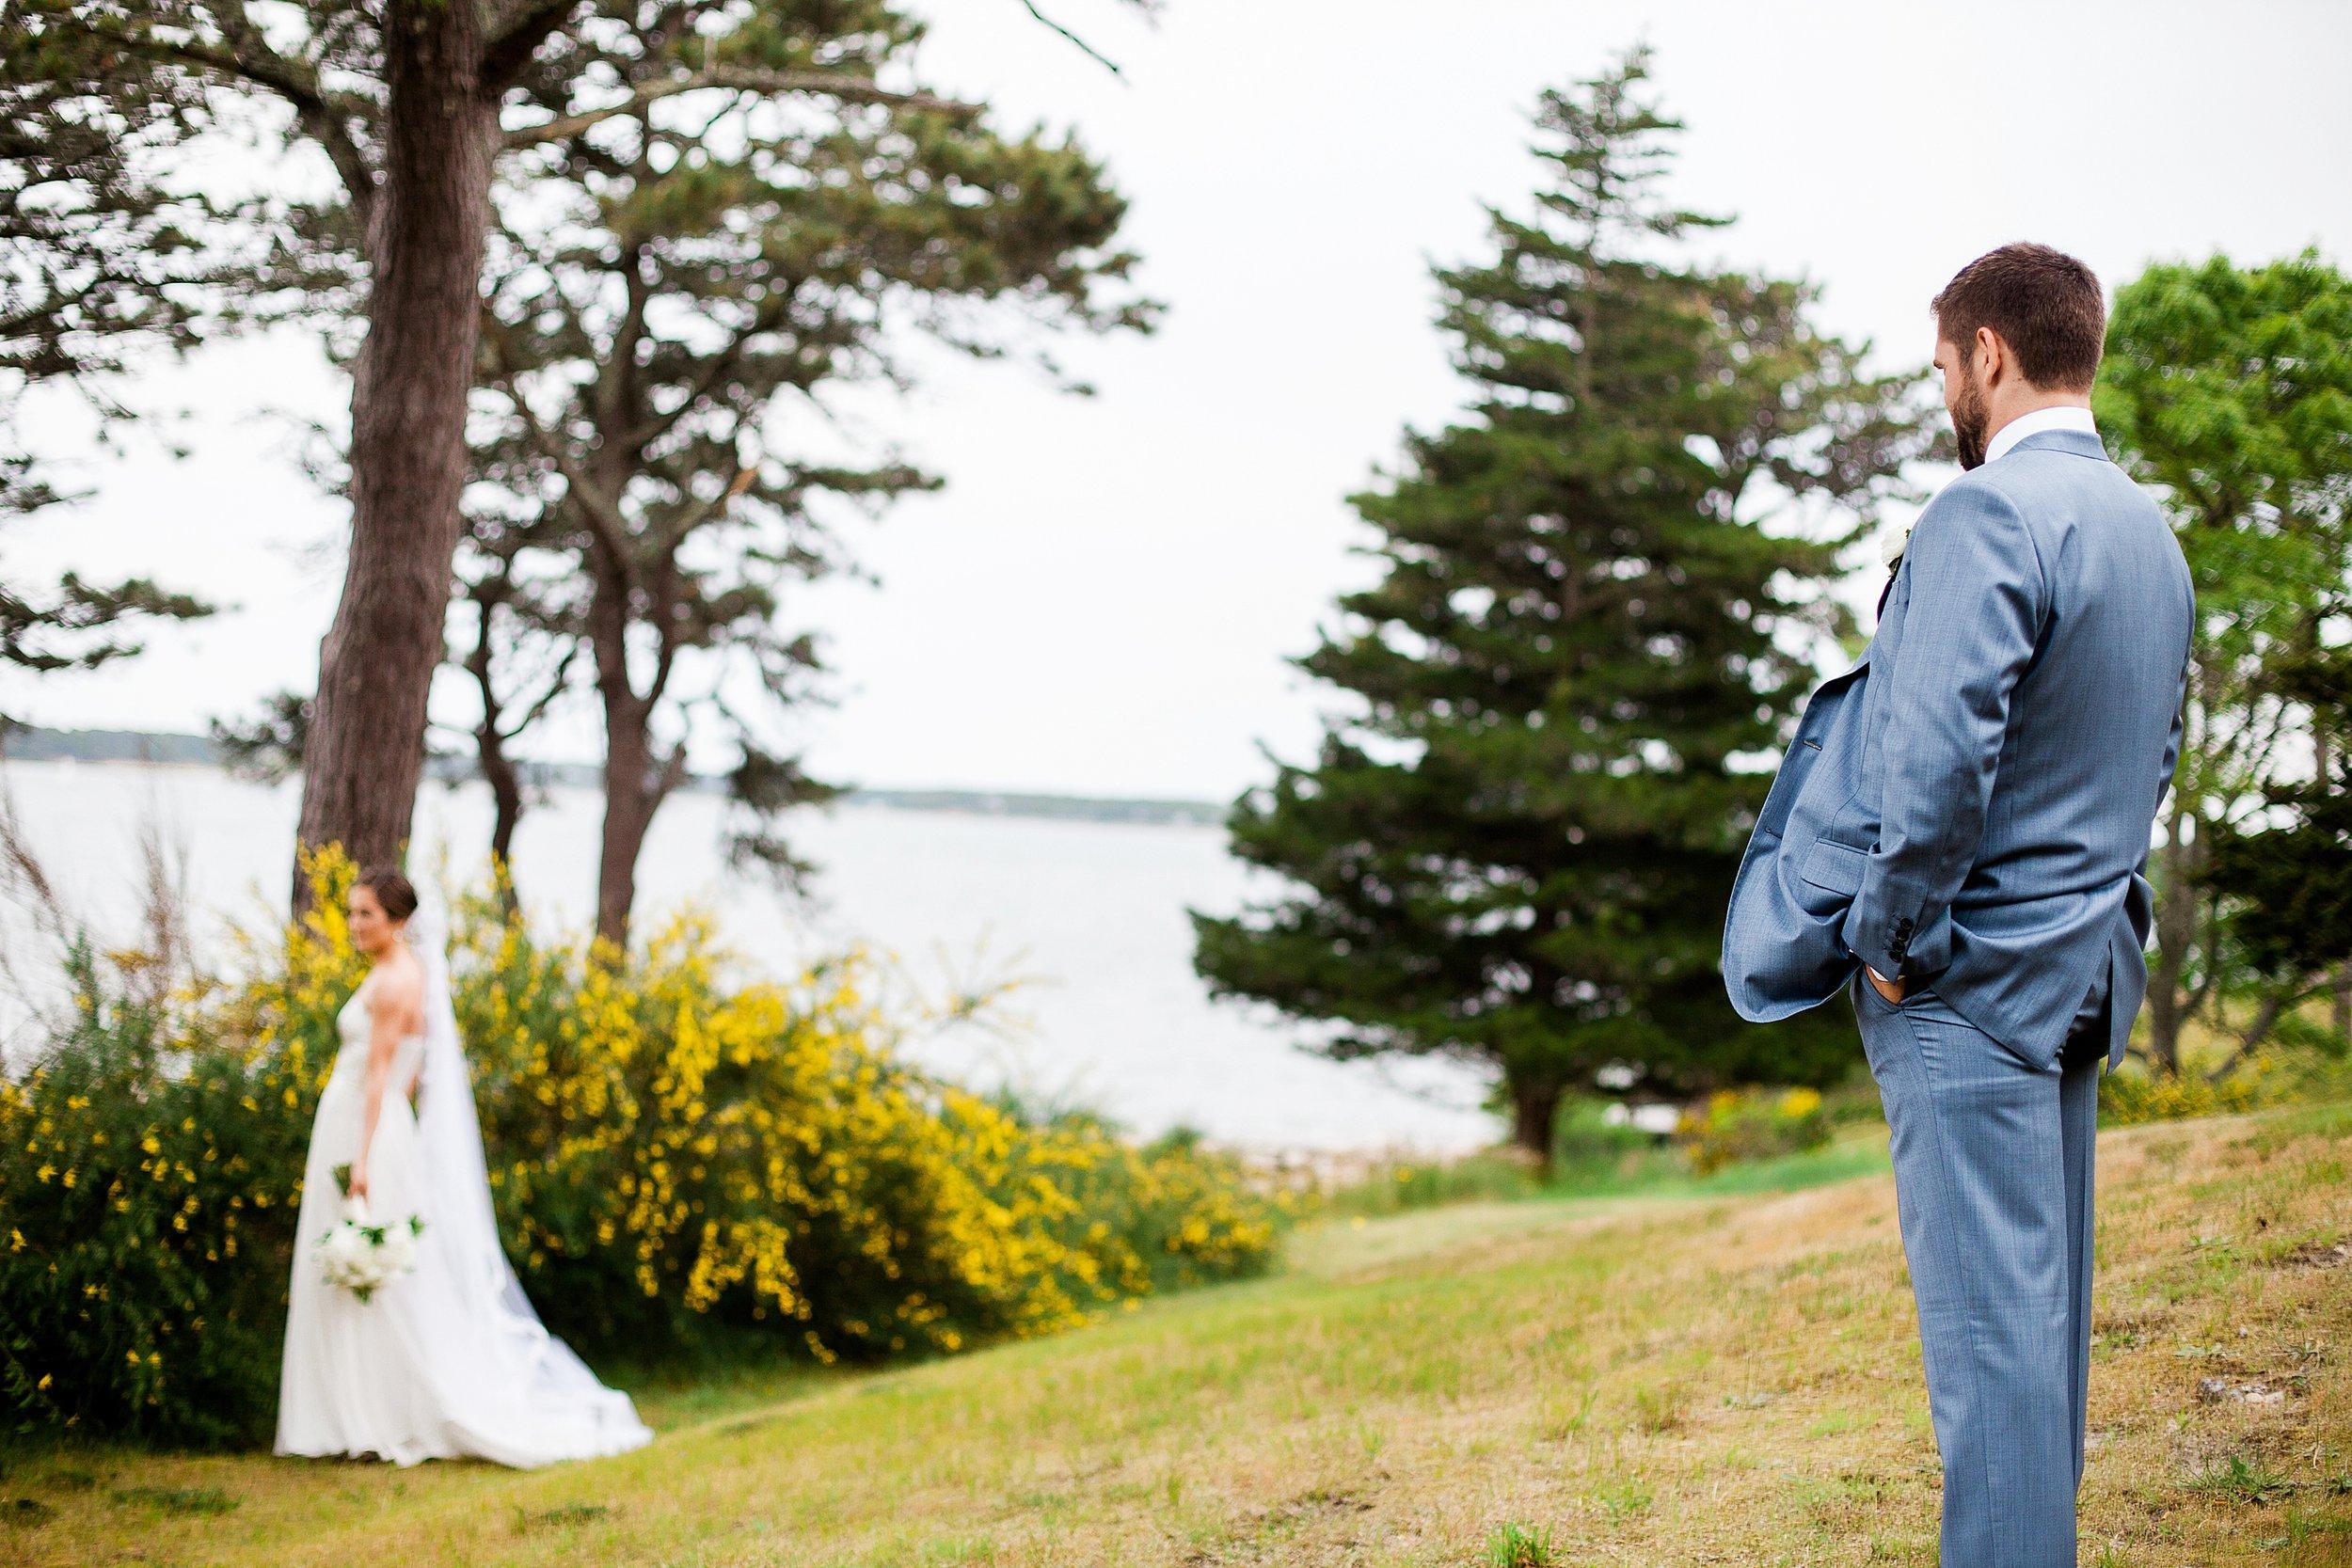 020 los angeles wedding photographer todd danforth photography cape cod.jpg